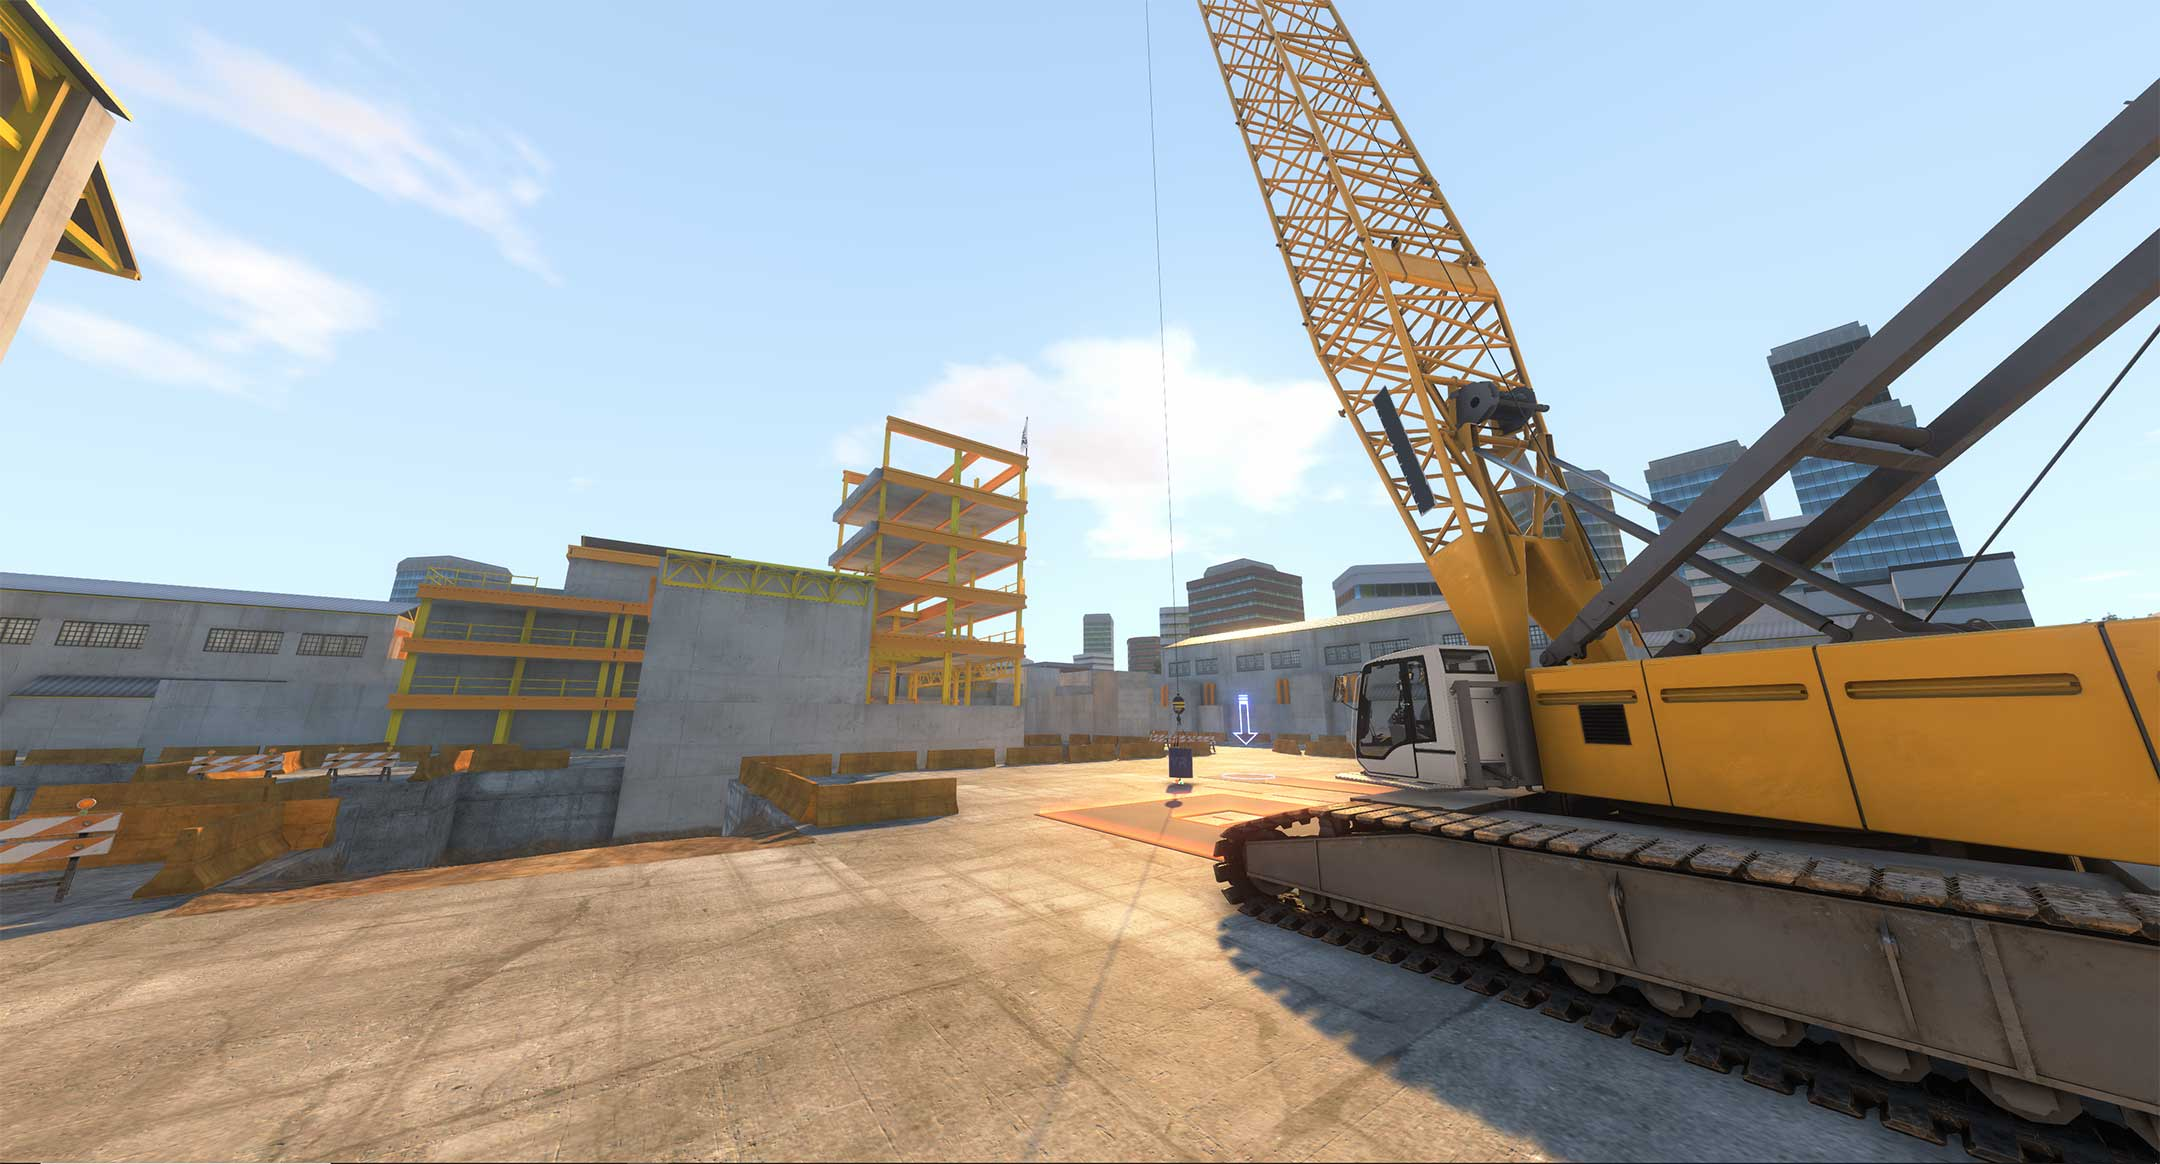 VR-HeavyLift-Slide-2160px-03-1